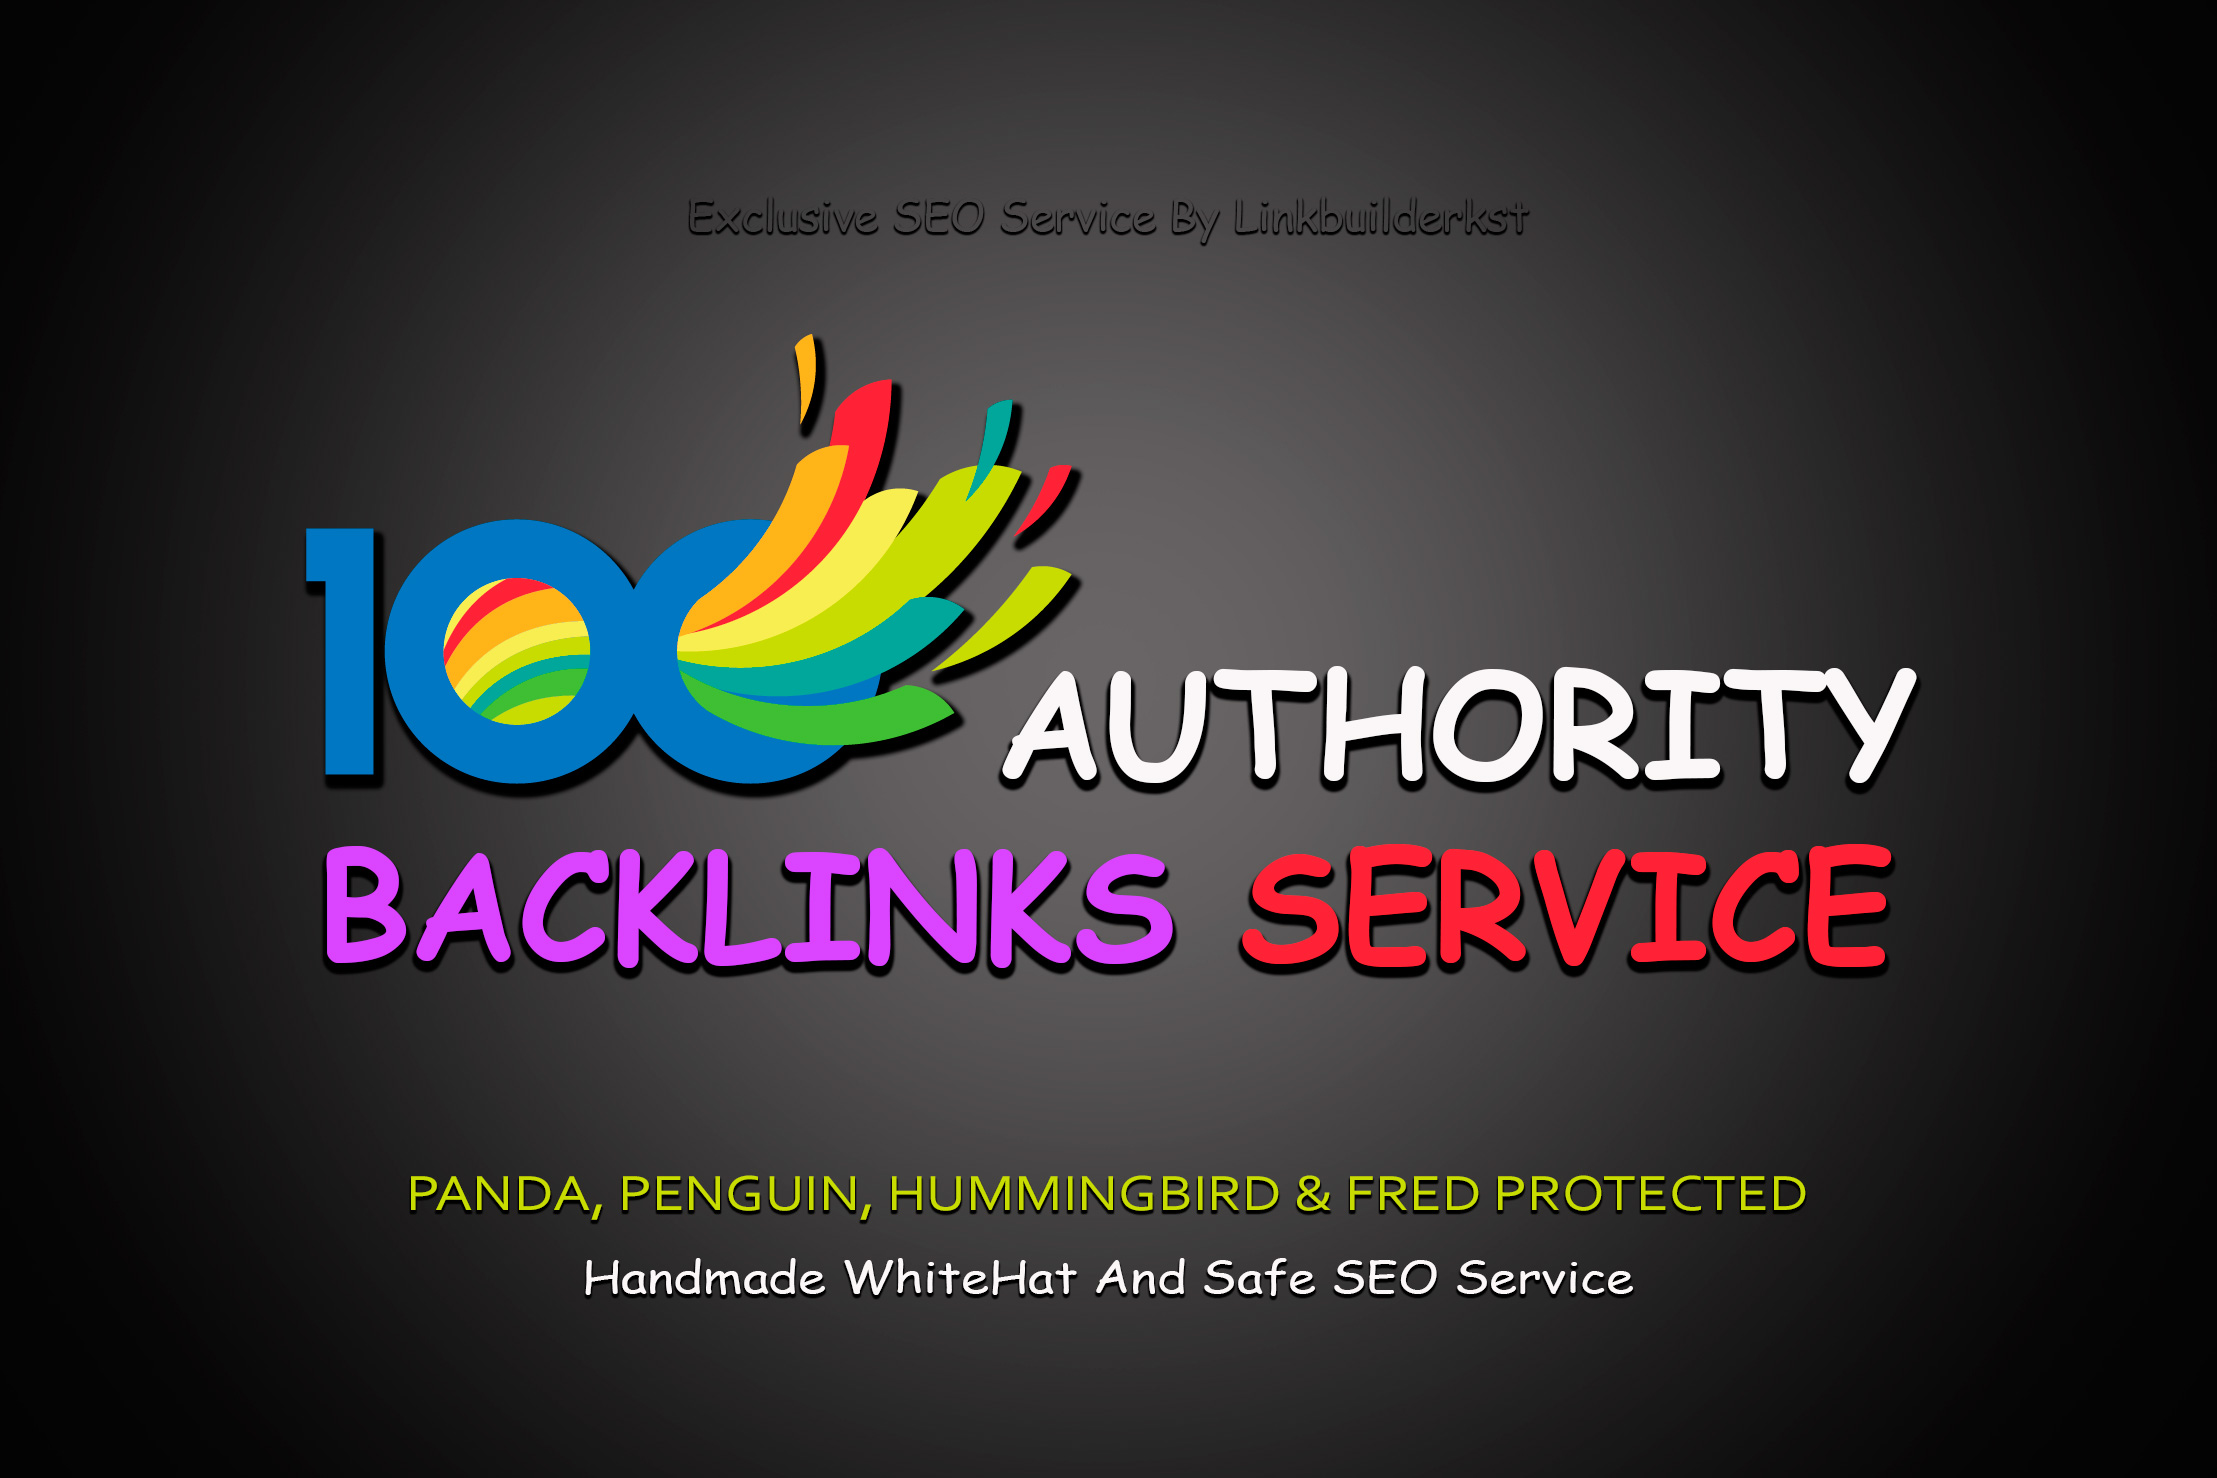 100 Pr9 Backlinks From Authority Unique Platforms